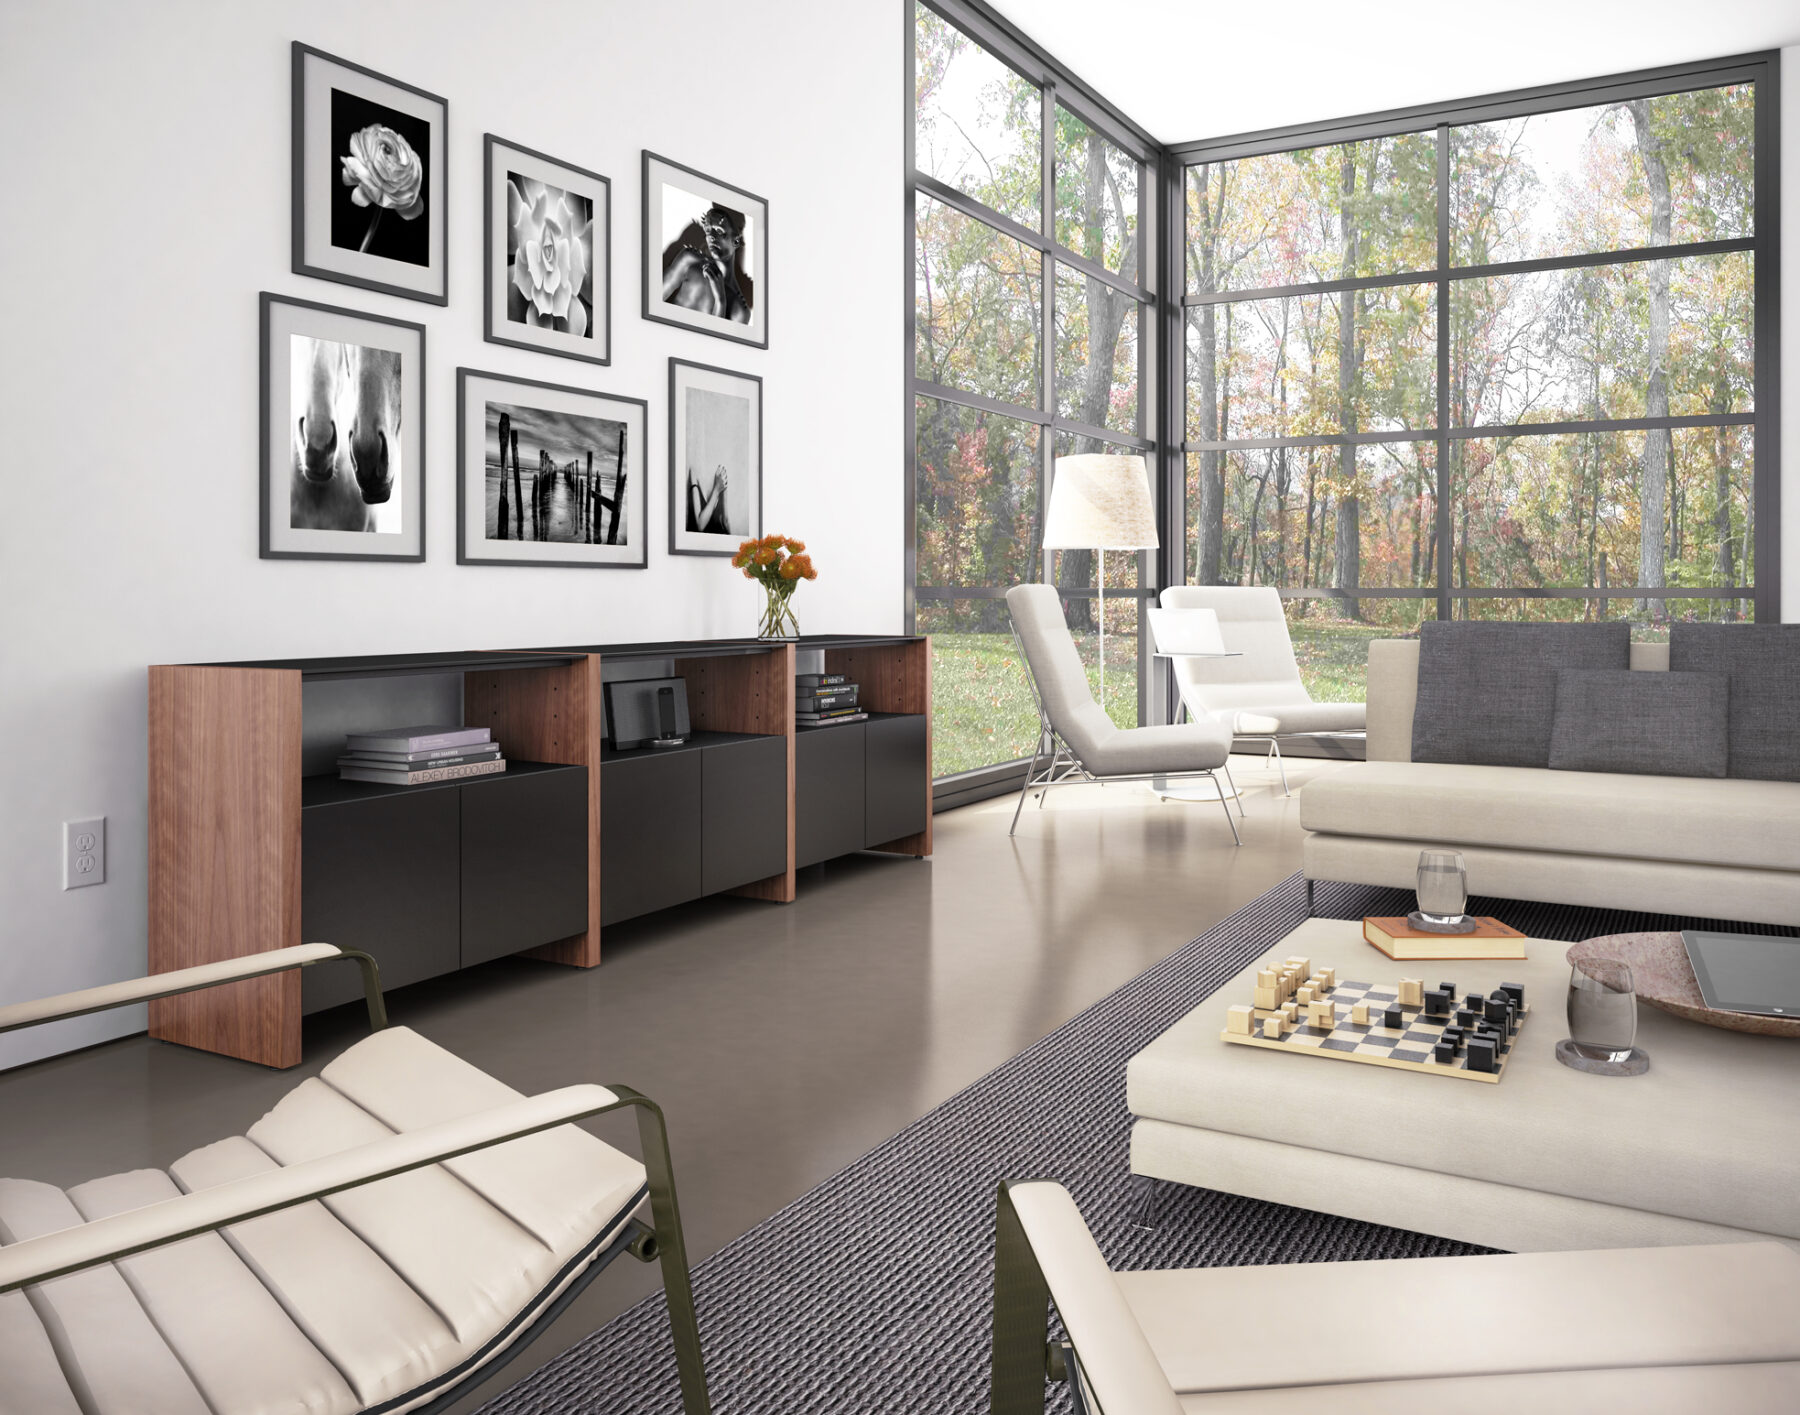 semblance-5453eg-bdi-walnut-modular-storage-system-lifestyle-1